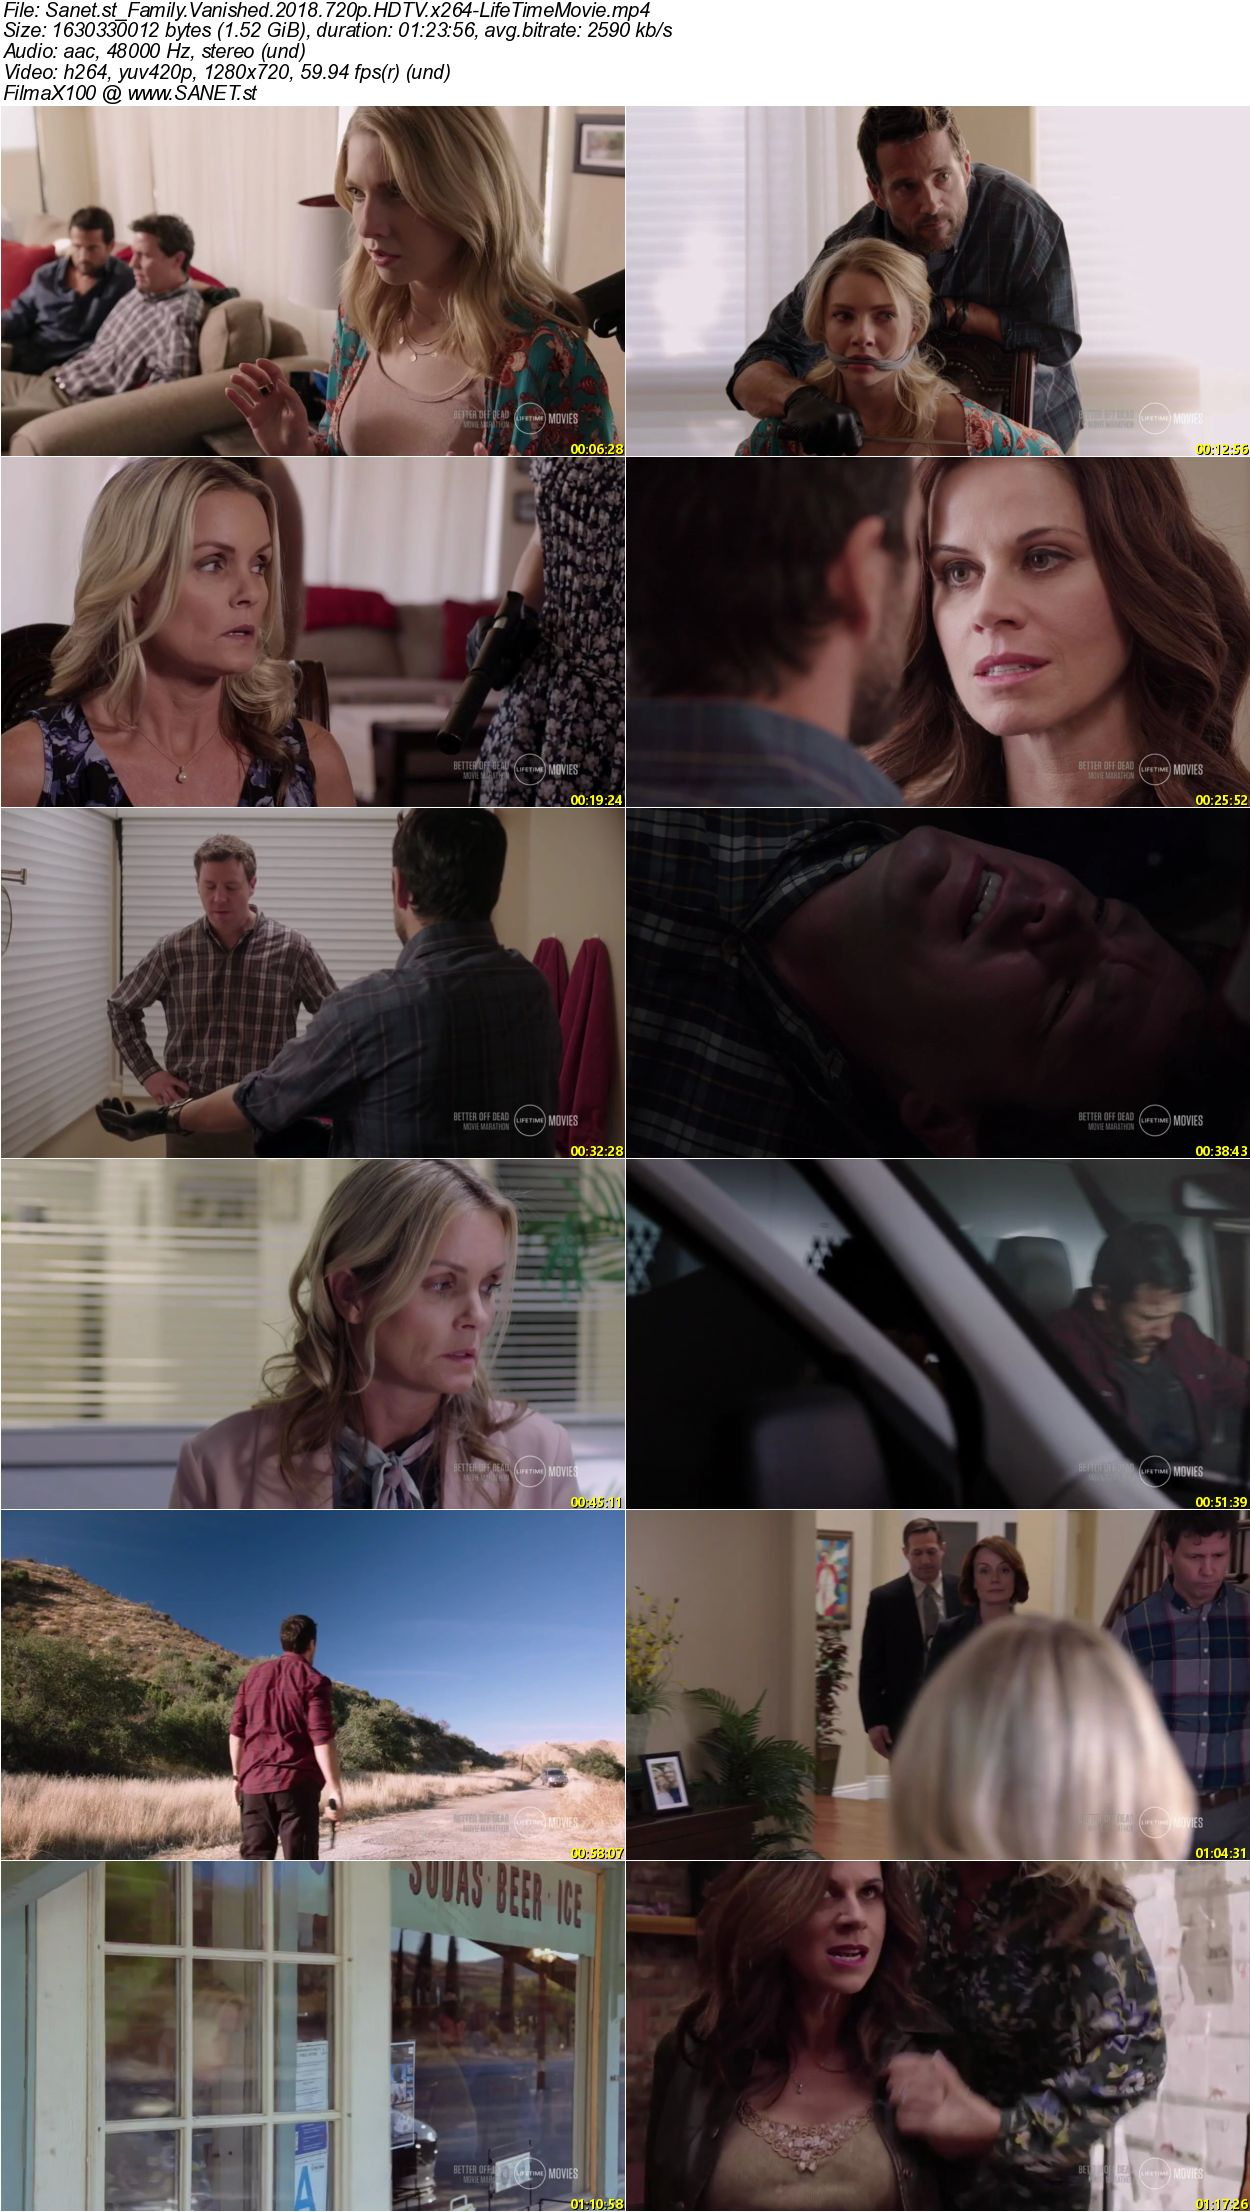 Download Family Vanished 2018 720p HDTV x264-LifeTimeMovie